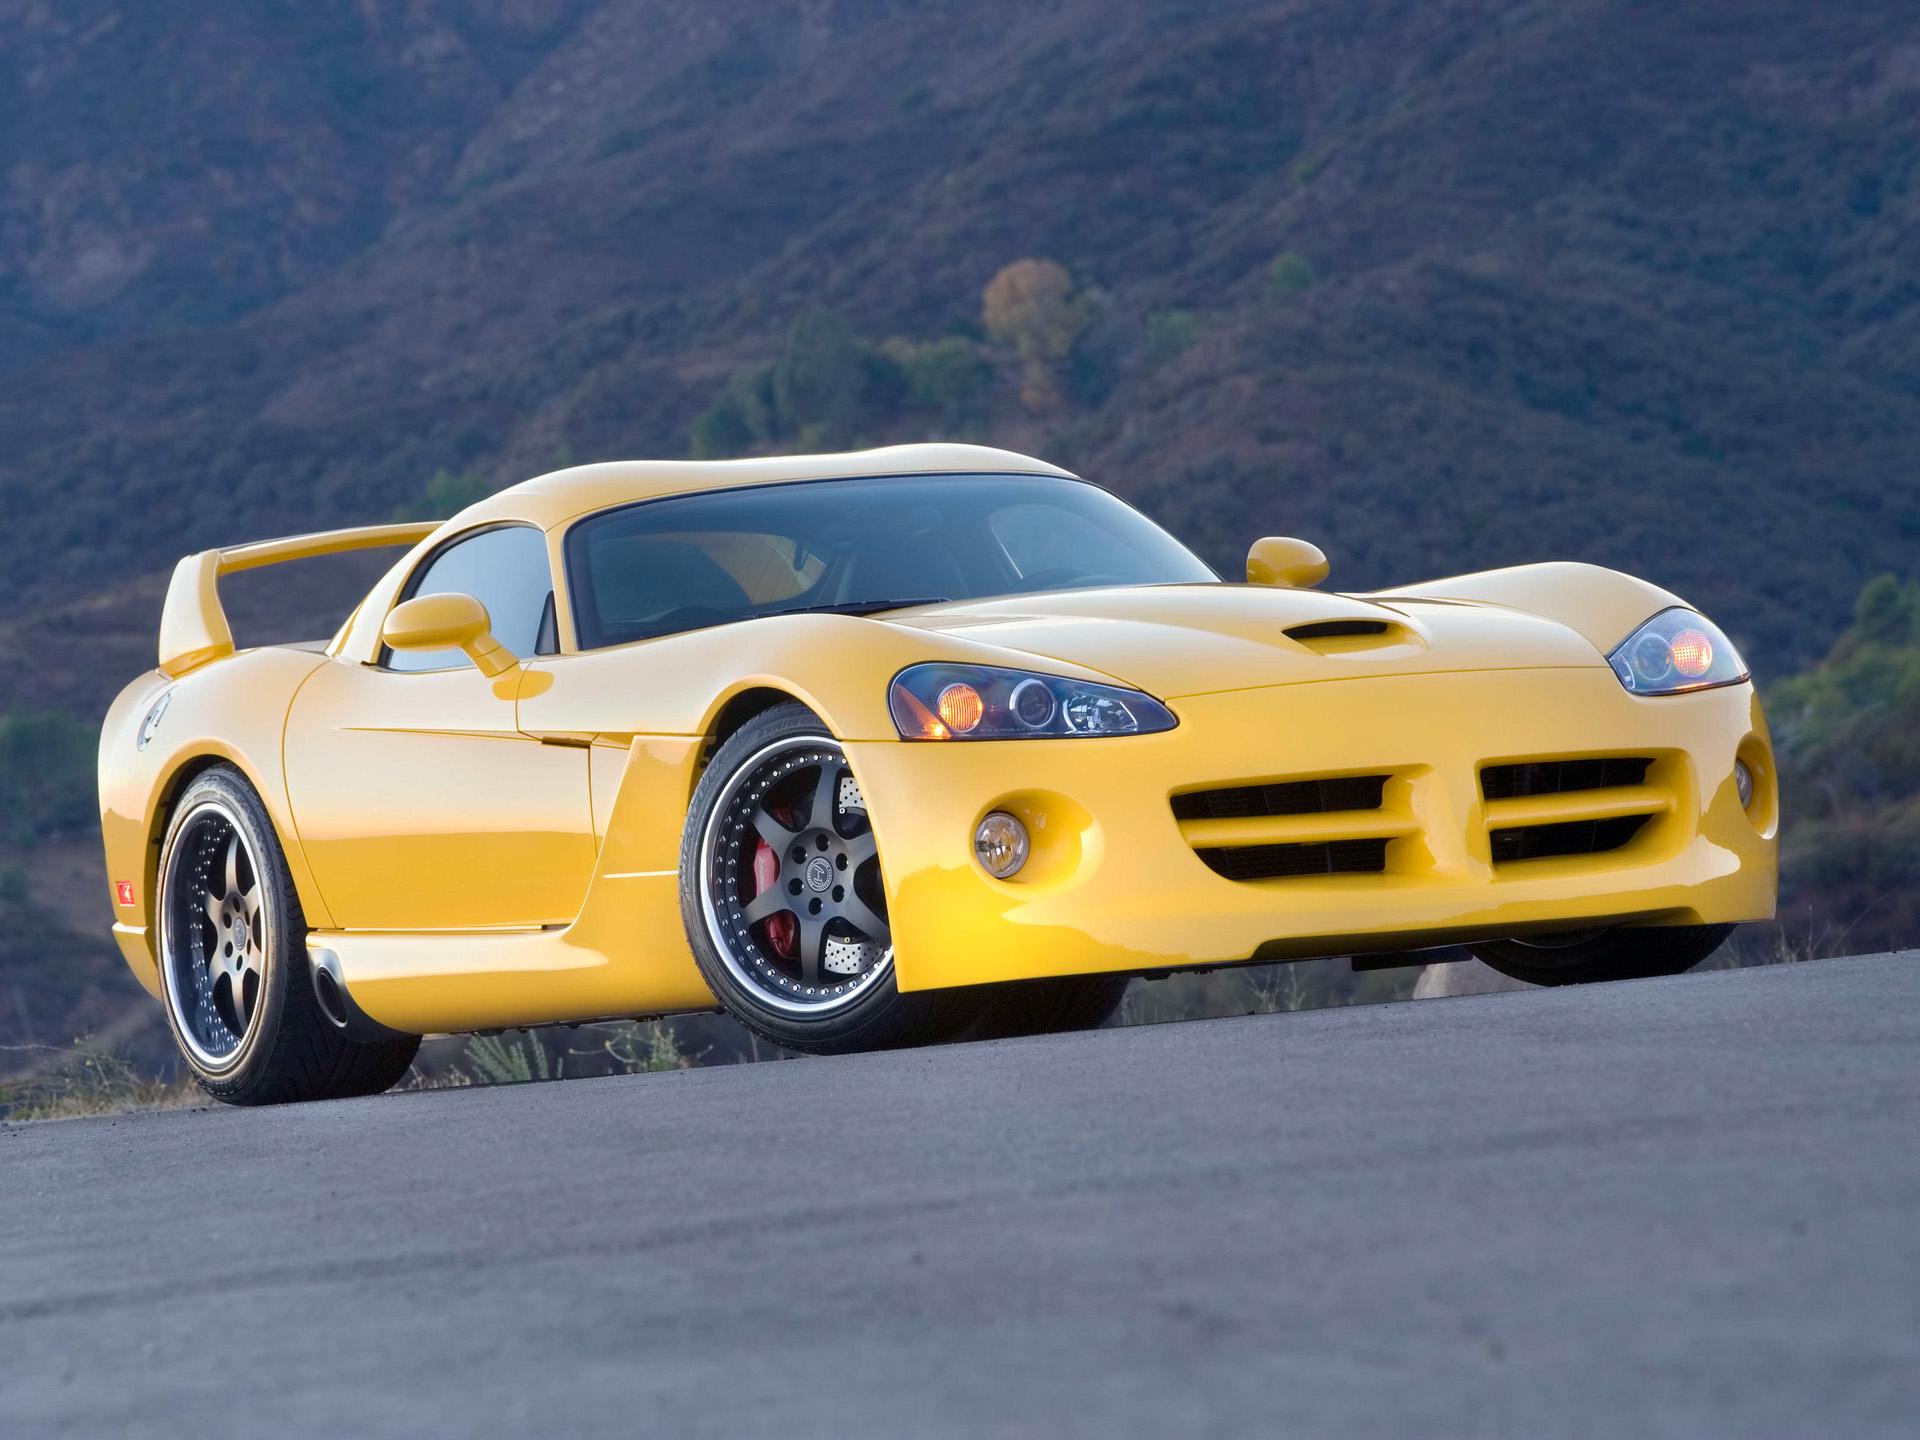 Venom Gt Price >> 2007 Hennessey Venom 1000 Twin Turbo Viper SRT Pictures, History, Value, Research, News ...